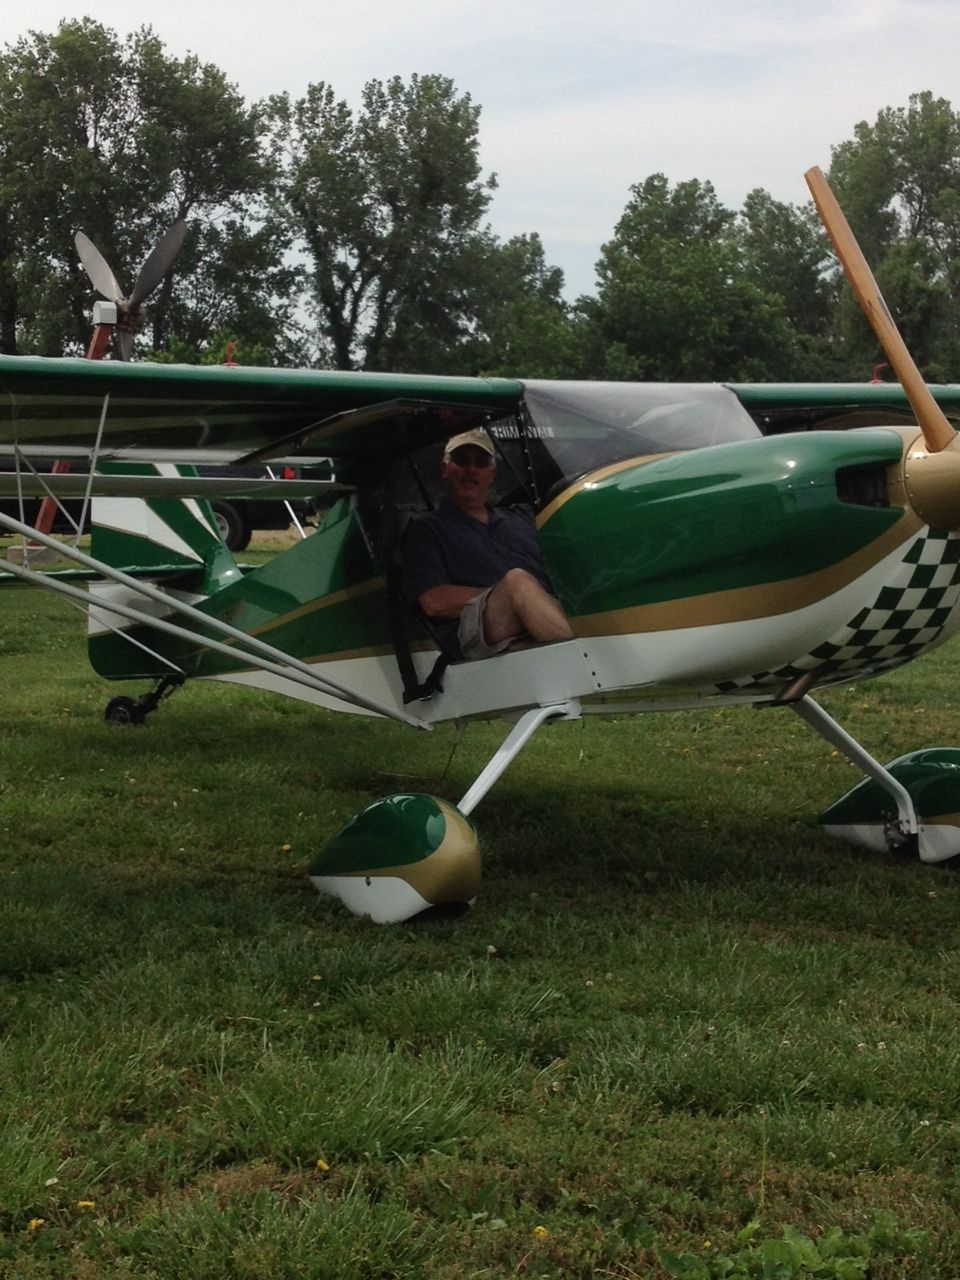 Kitfox 6 | Airplanes | Private plane, Airplane, Aircraft